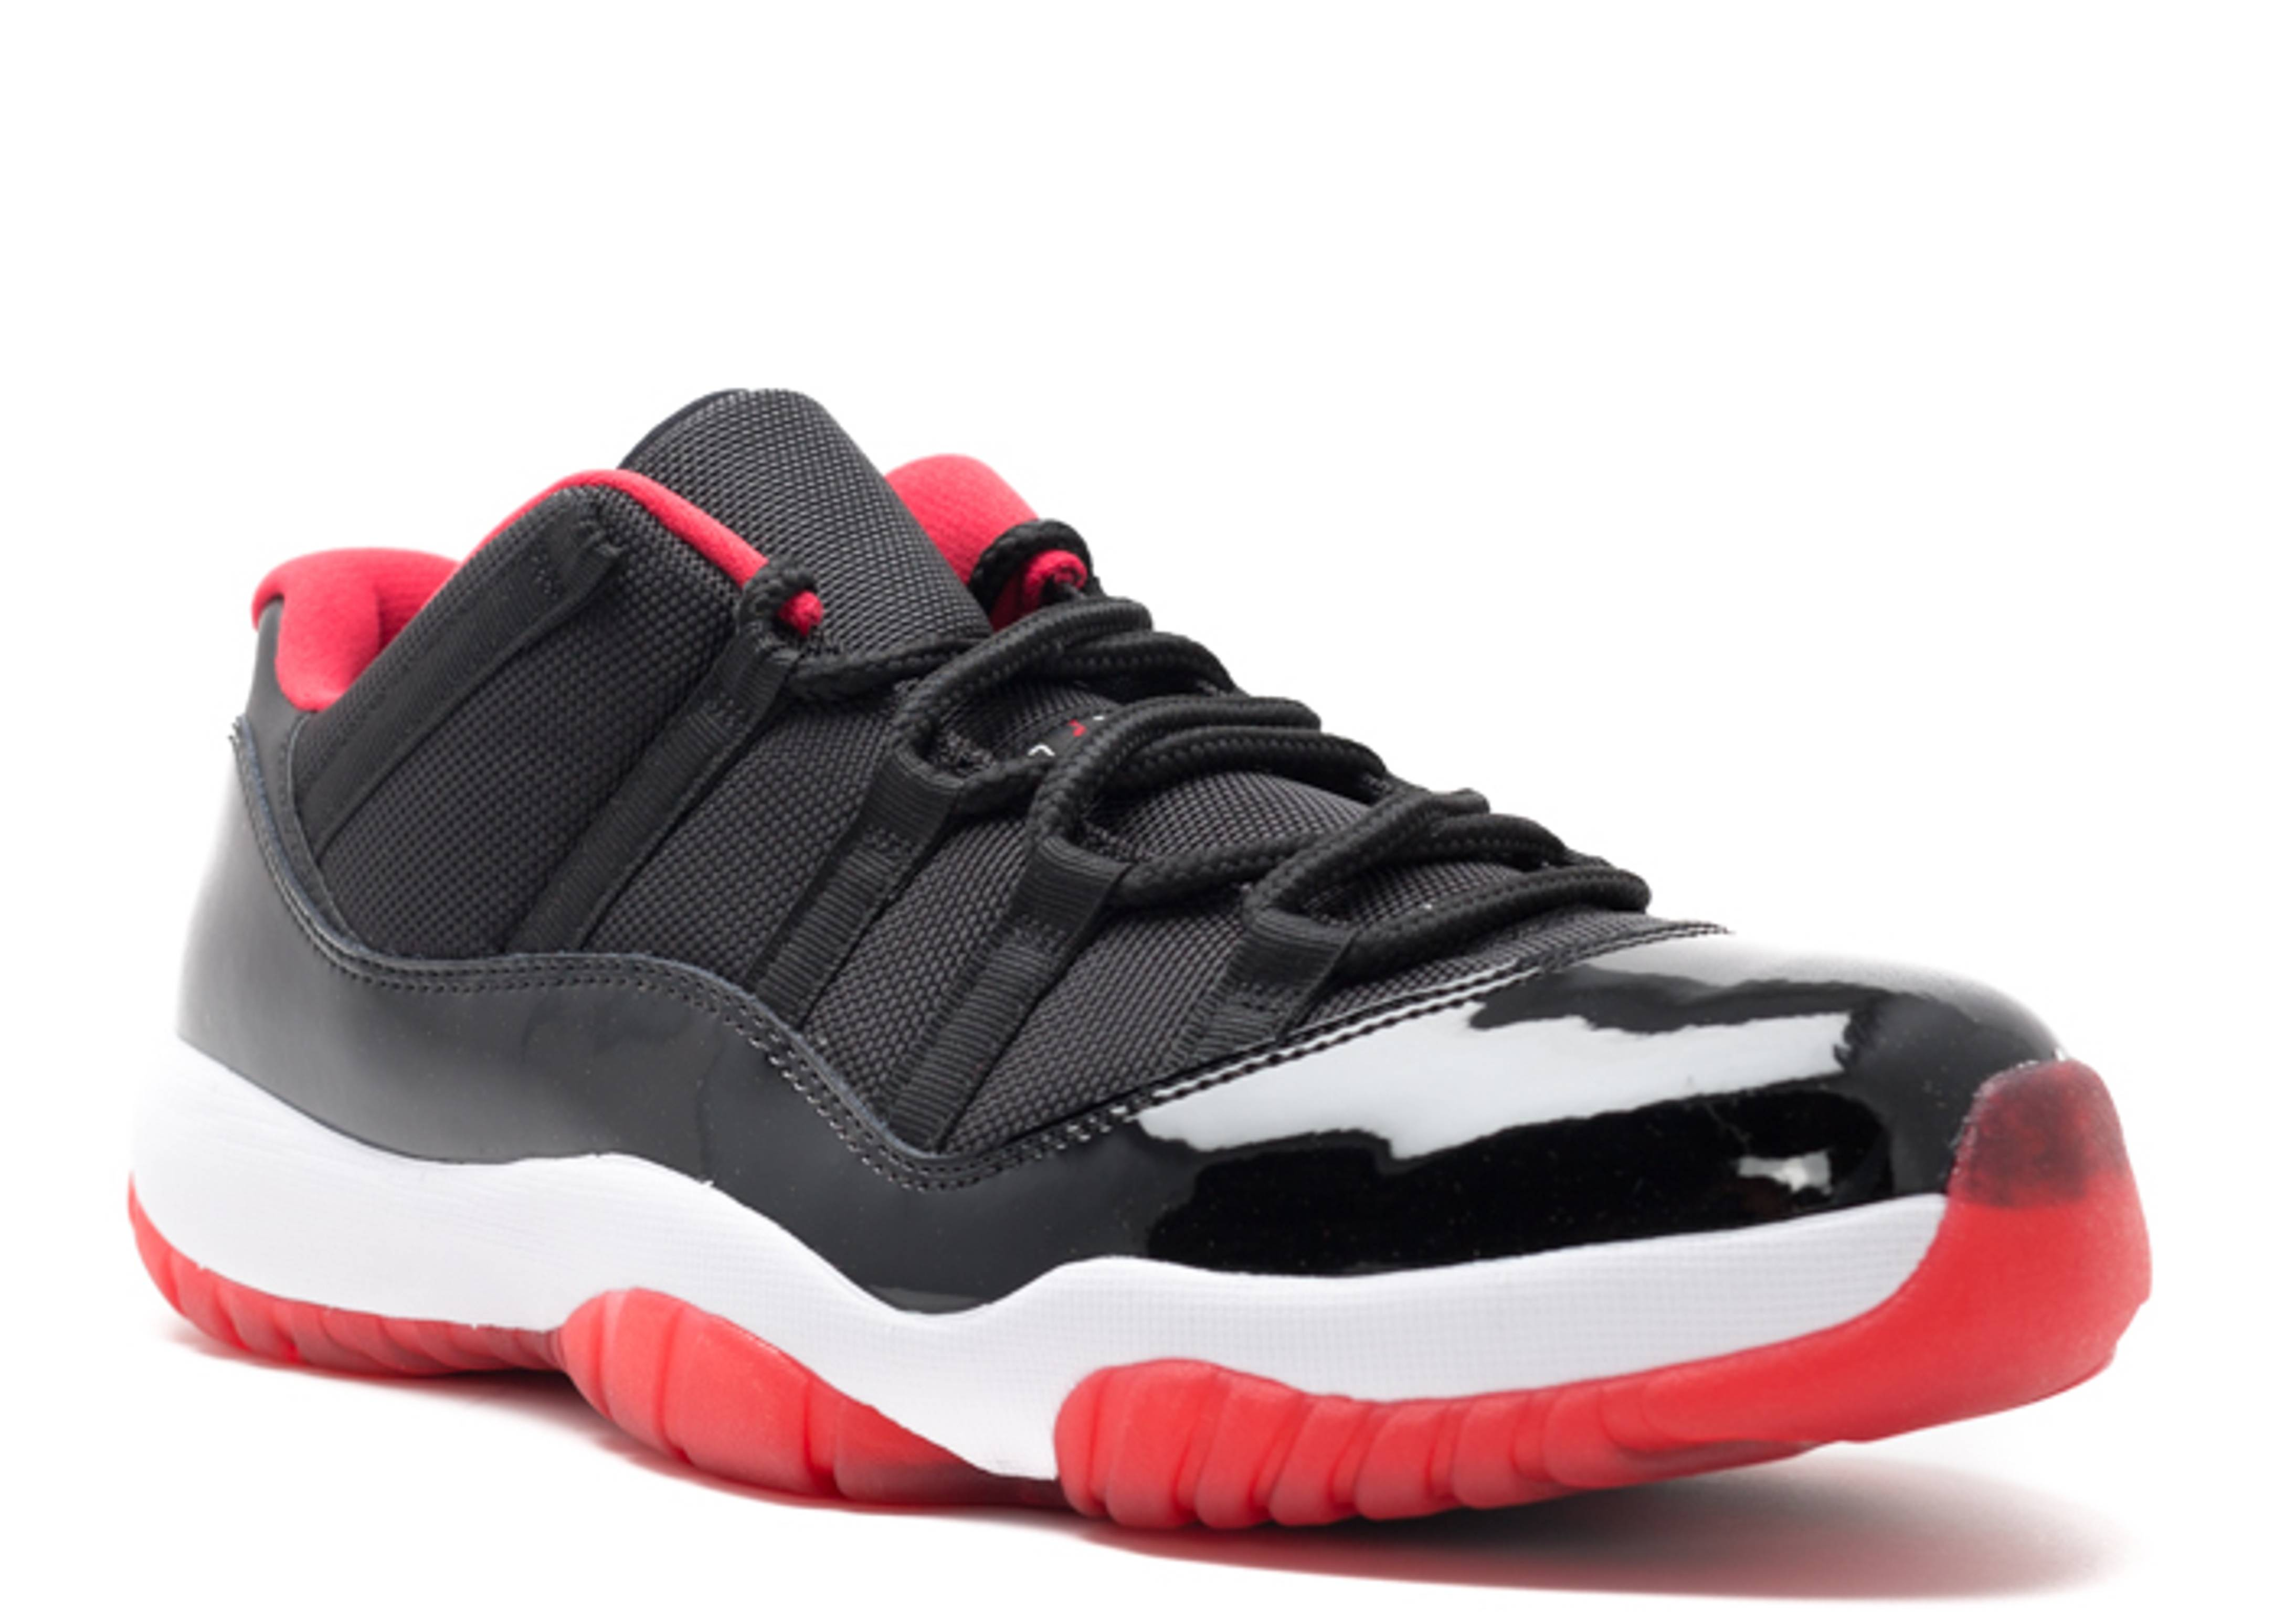 "nike shox le vert des hommes - air jordan 11 retro low ""bred"" - black/true red-white - Air Jordan ..."